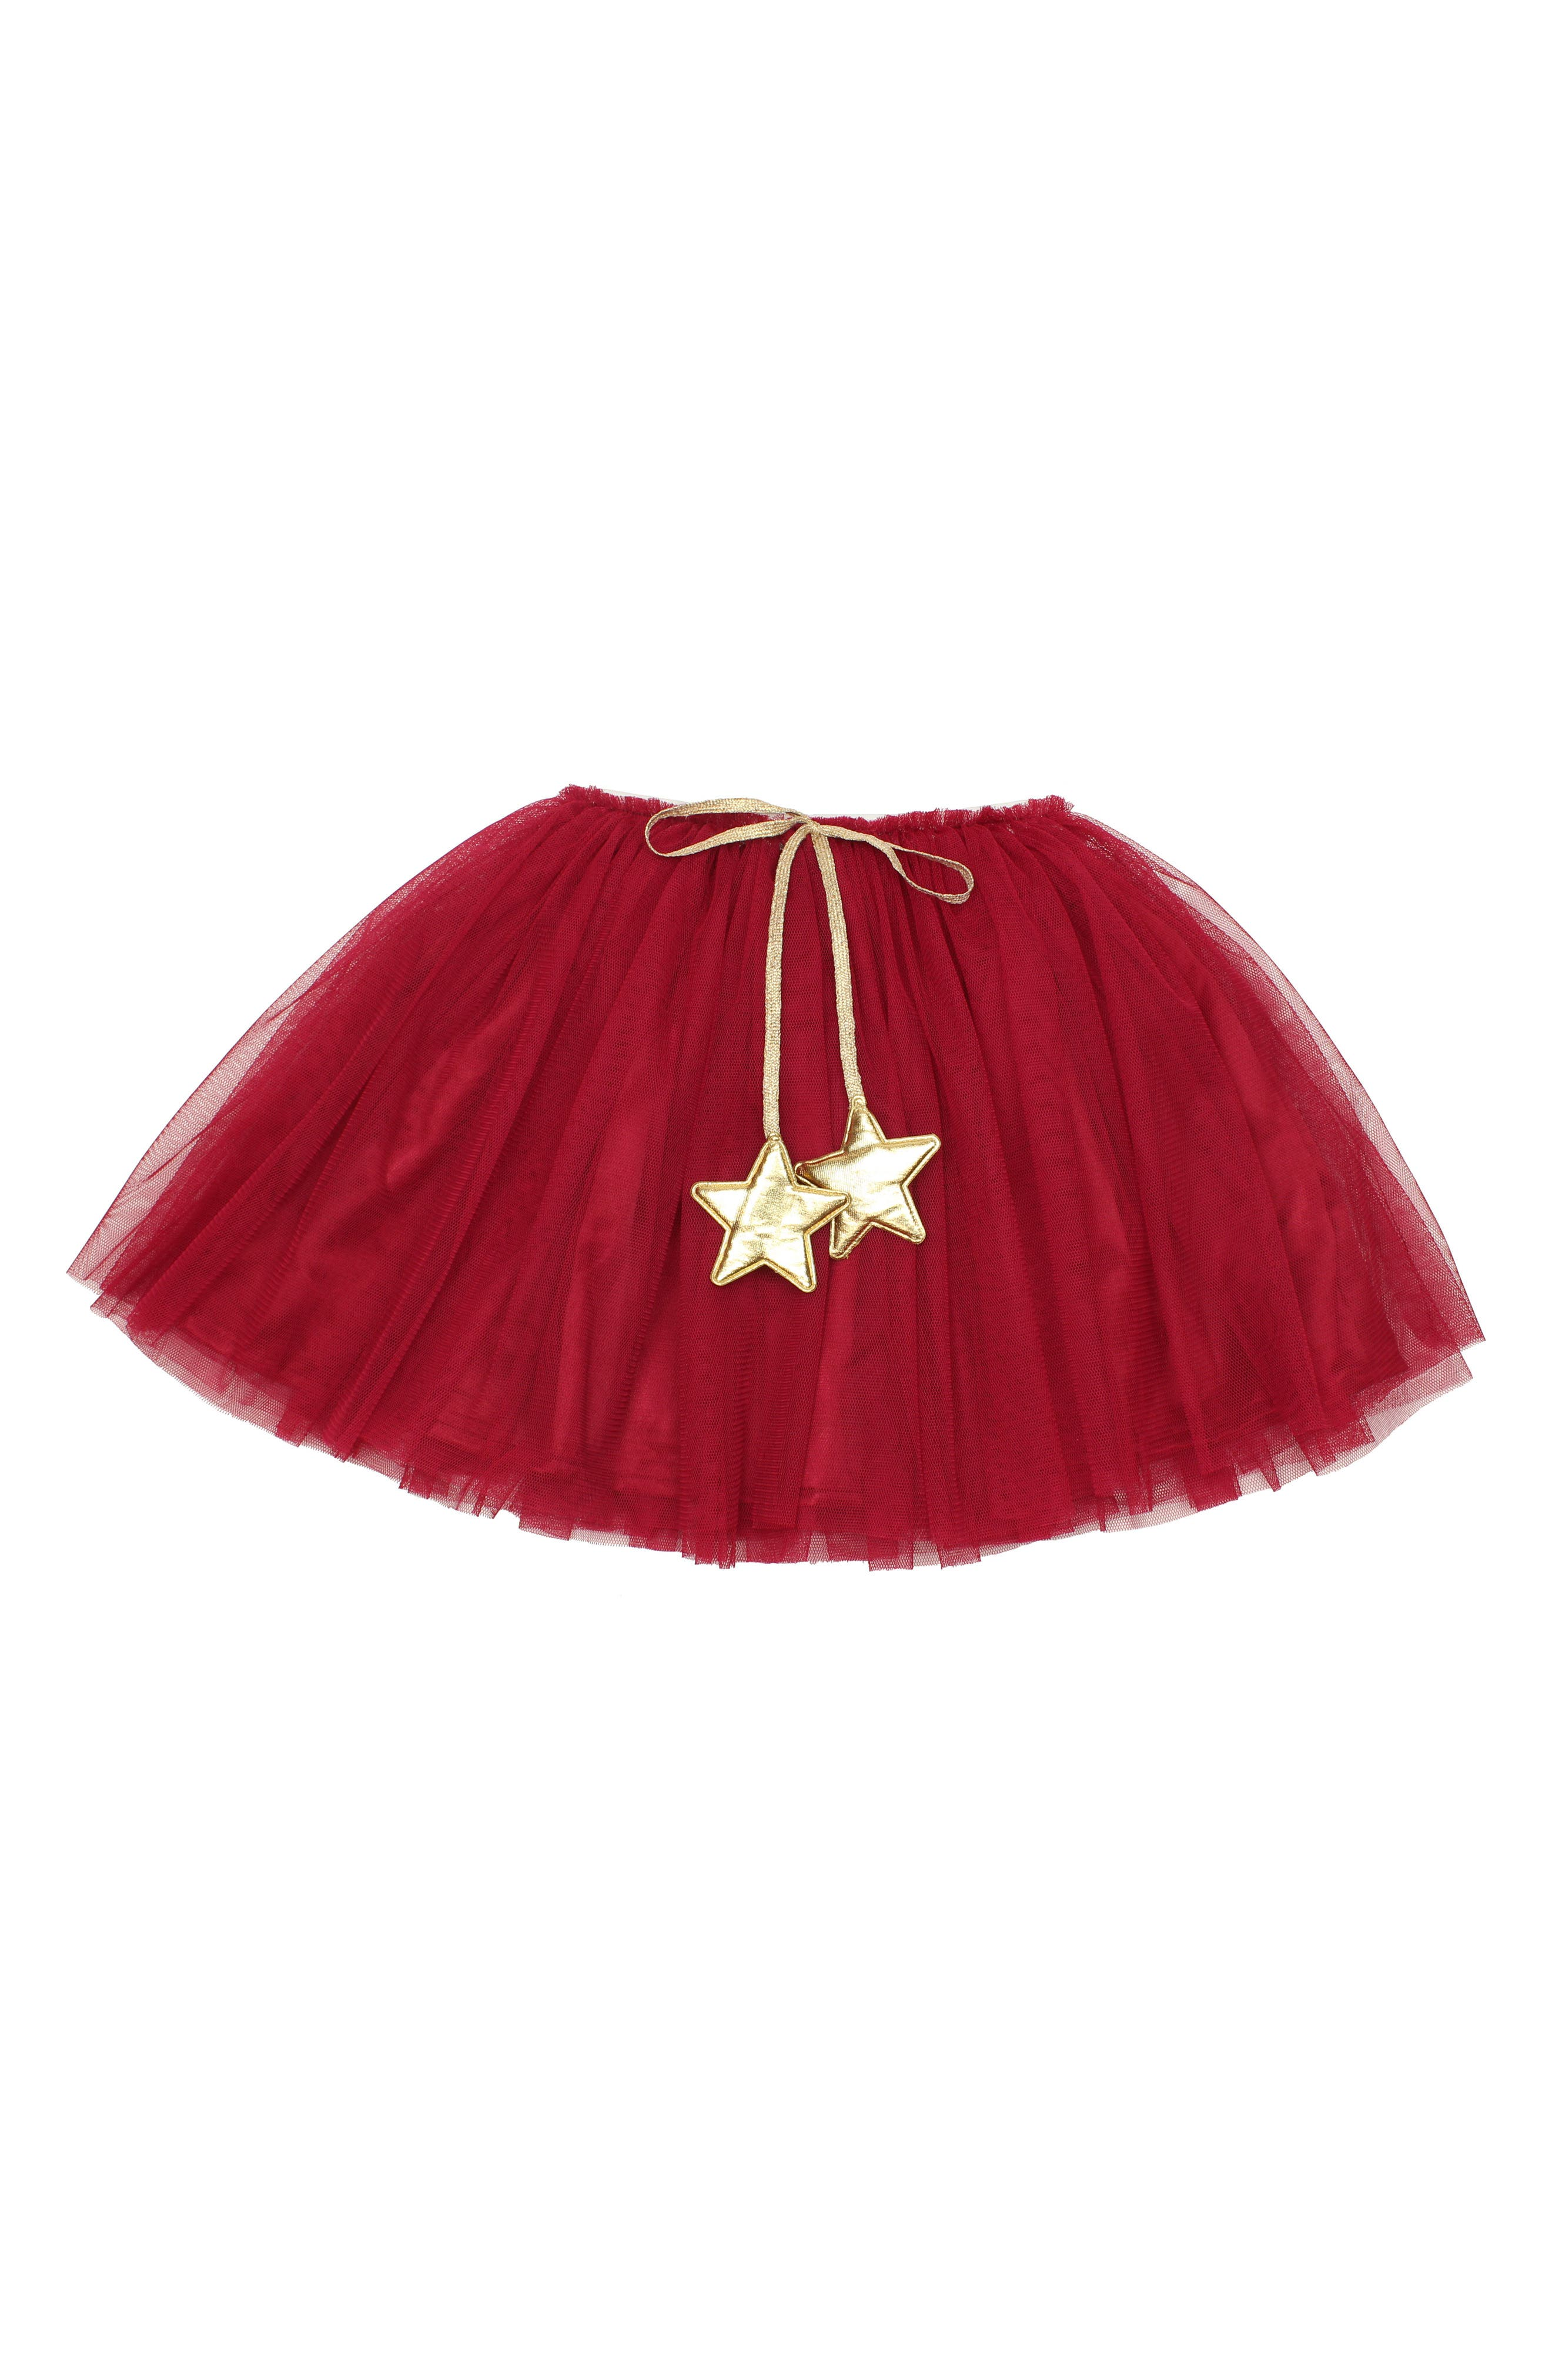 POPATU, Gold Star Tutu Skirt, Main thumbnail 1, color, 601